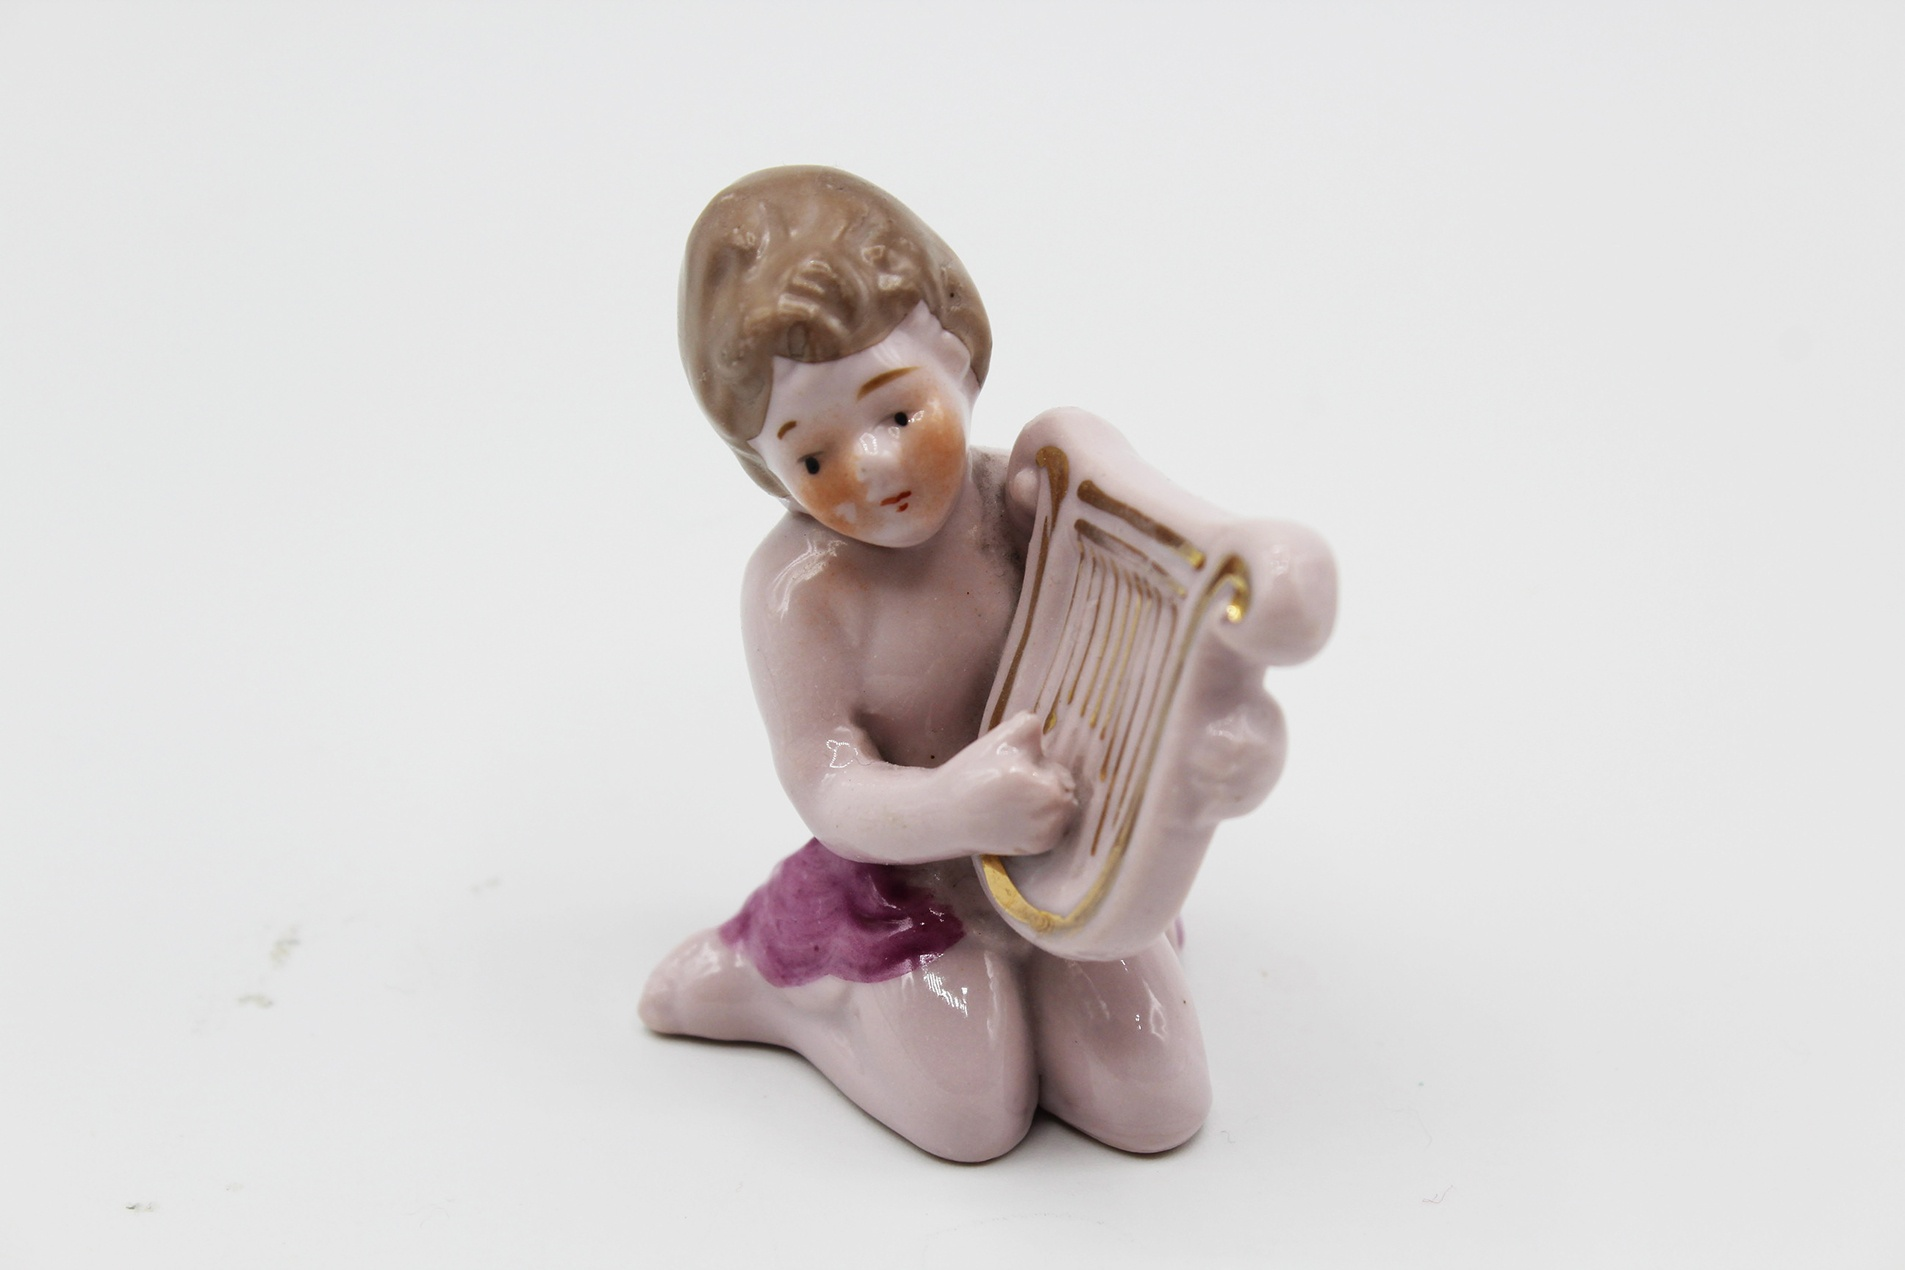 Vintage Miniature Boy w/ Lyre Harp Porcelain Figurine   Whispering City RVA